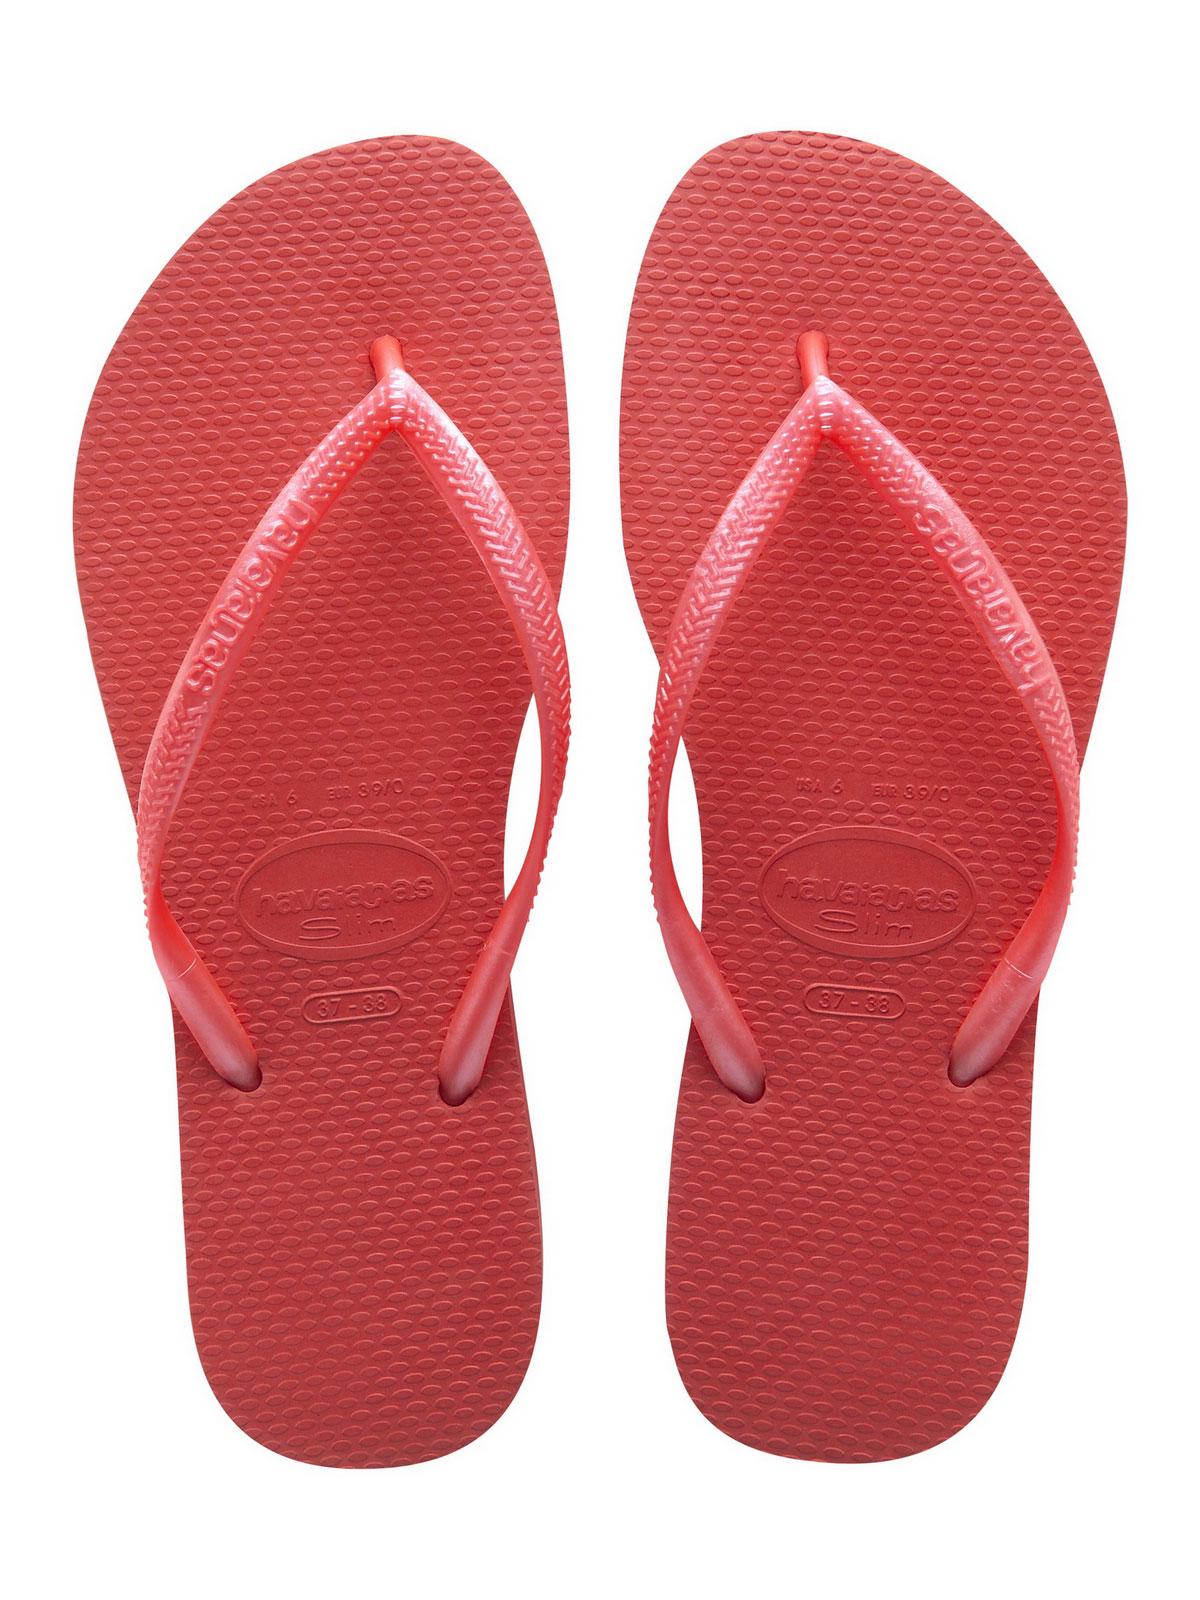 23d7537a7ab5c4 Flip-Flops Flip-flops - Slim Guava Red - Brand Havaianas